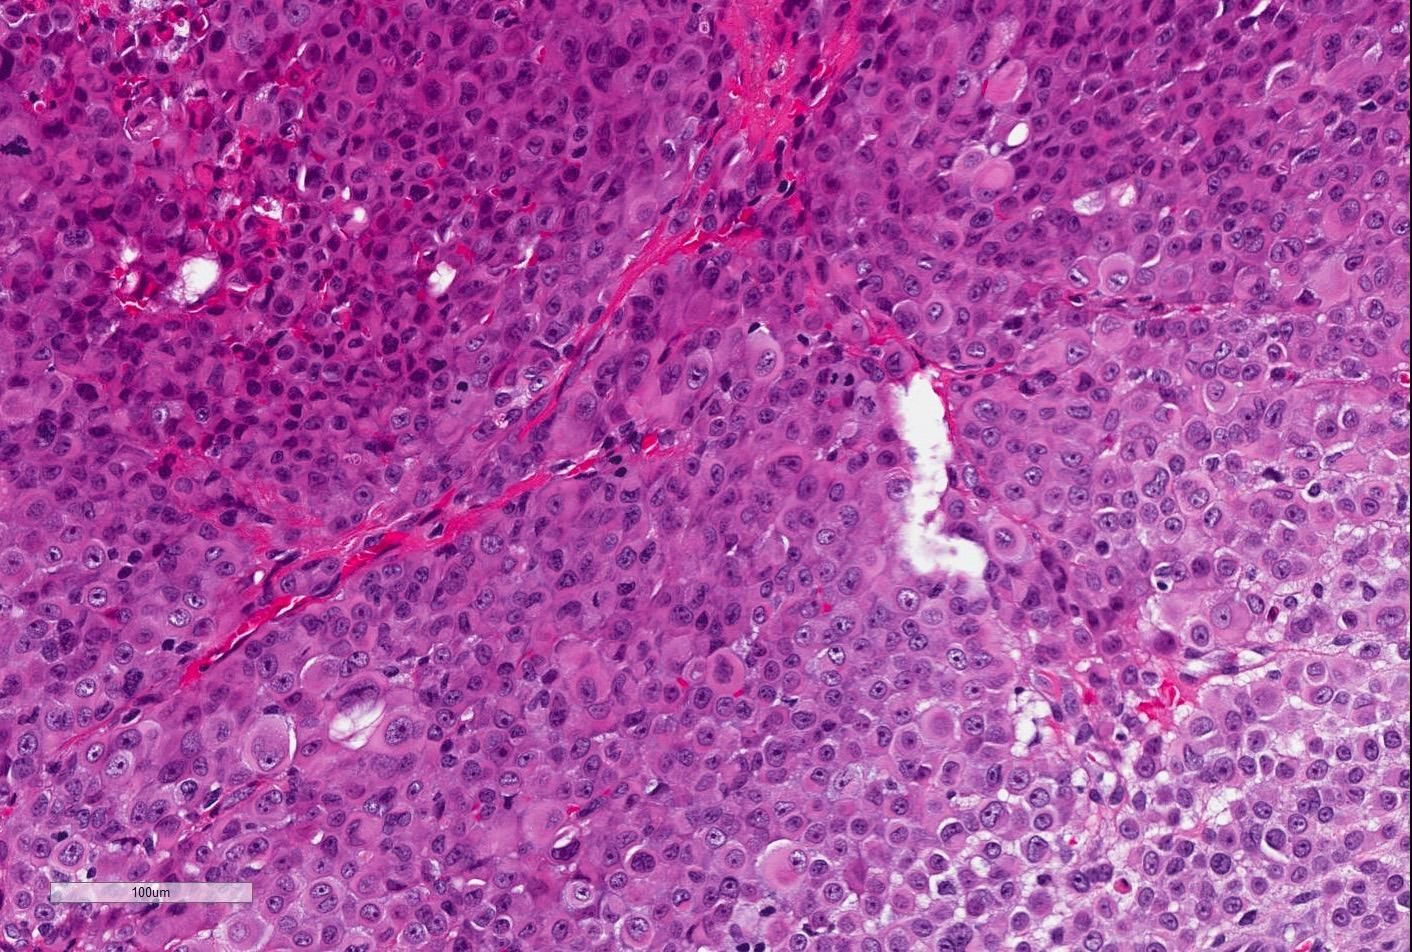 Epithelioid cells